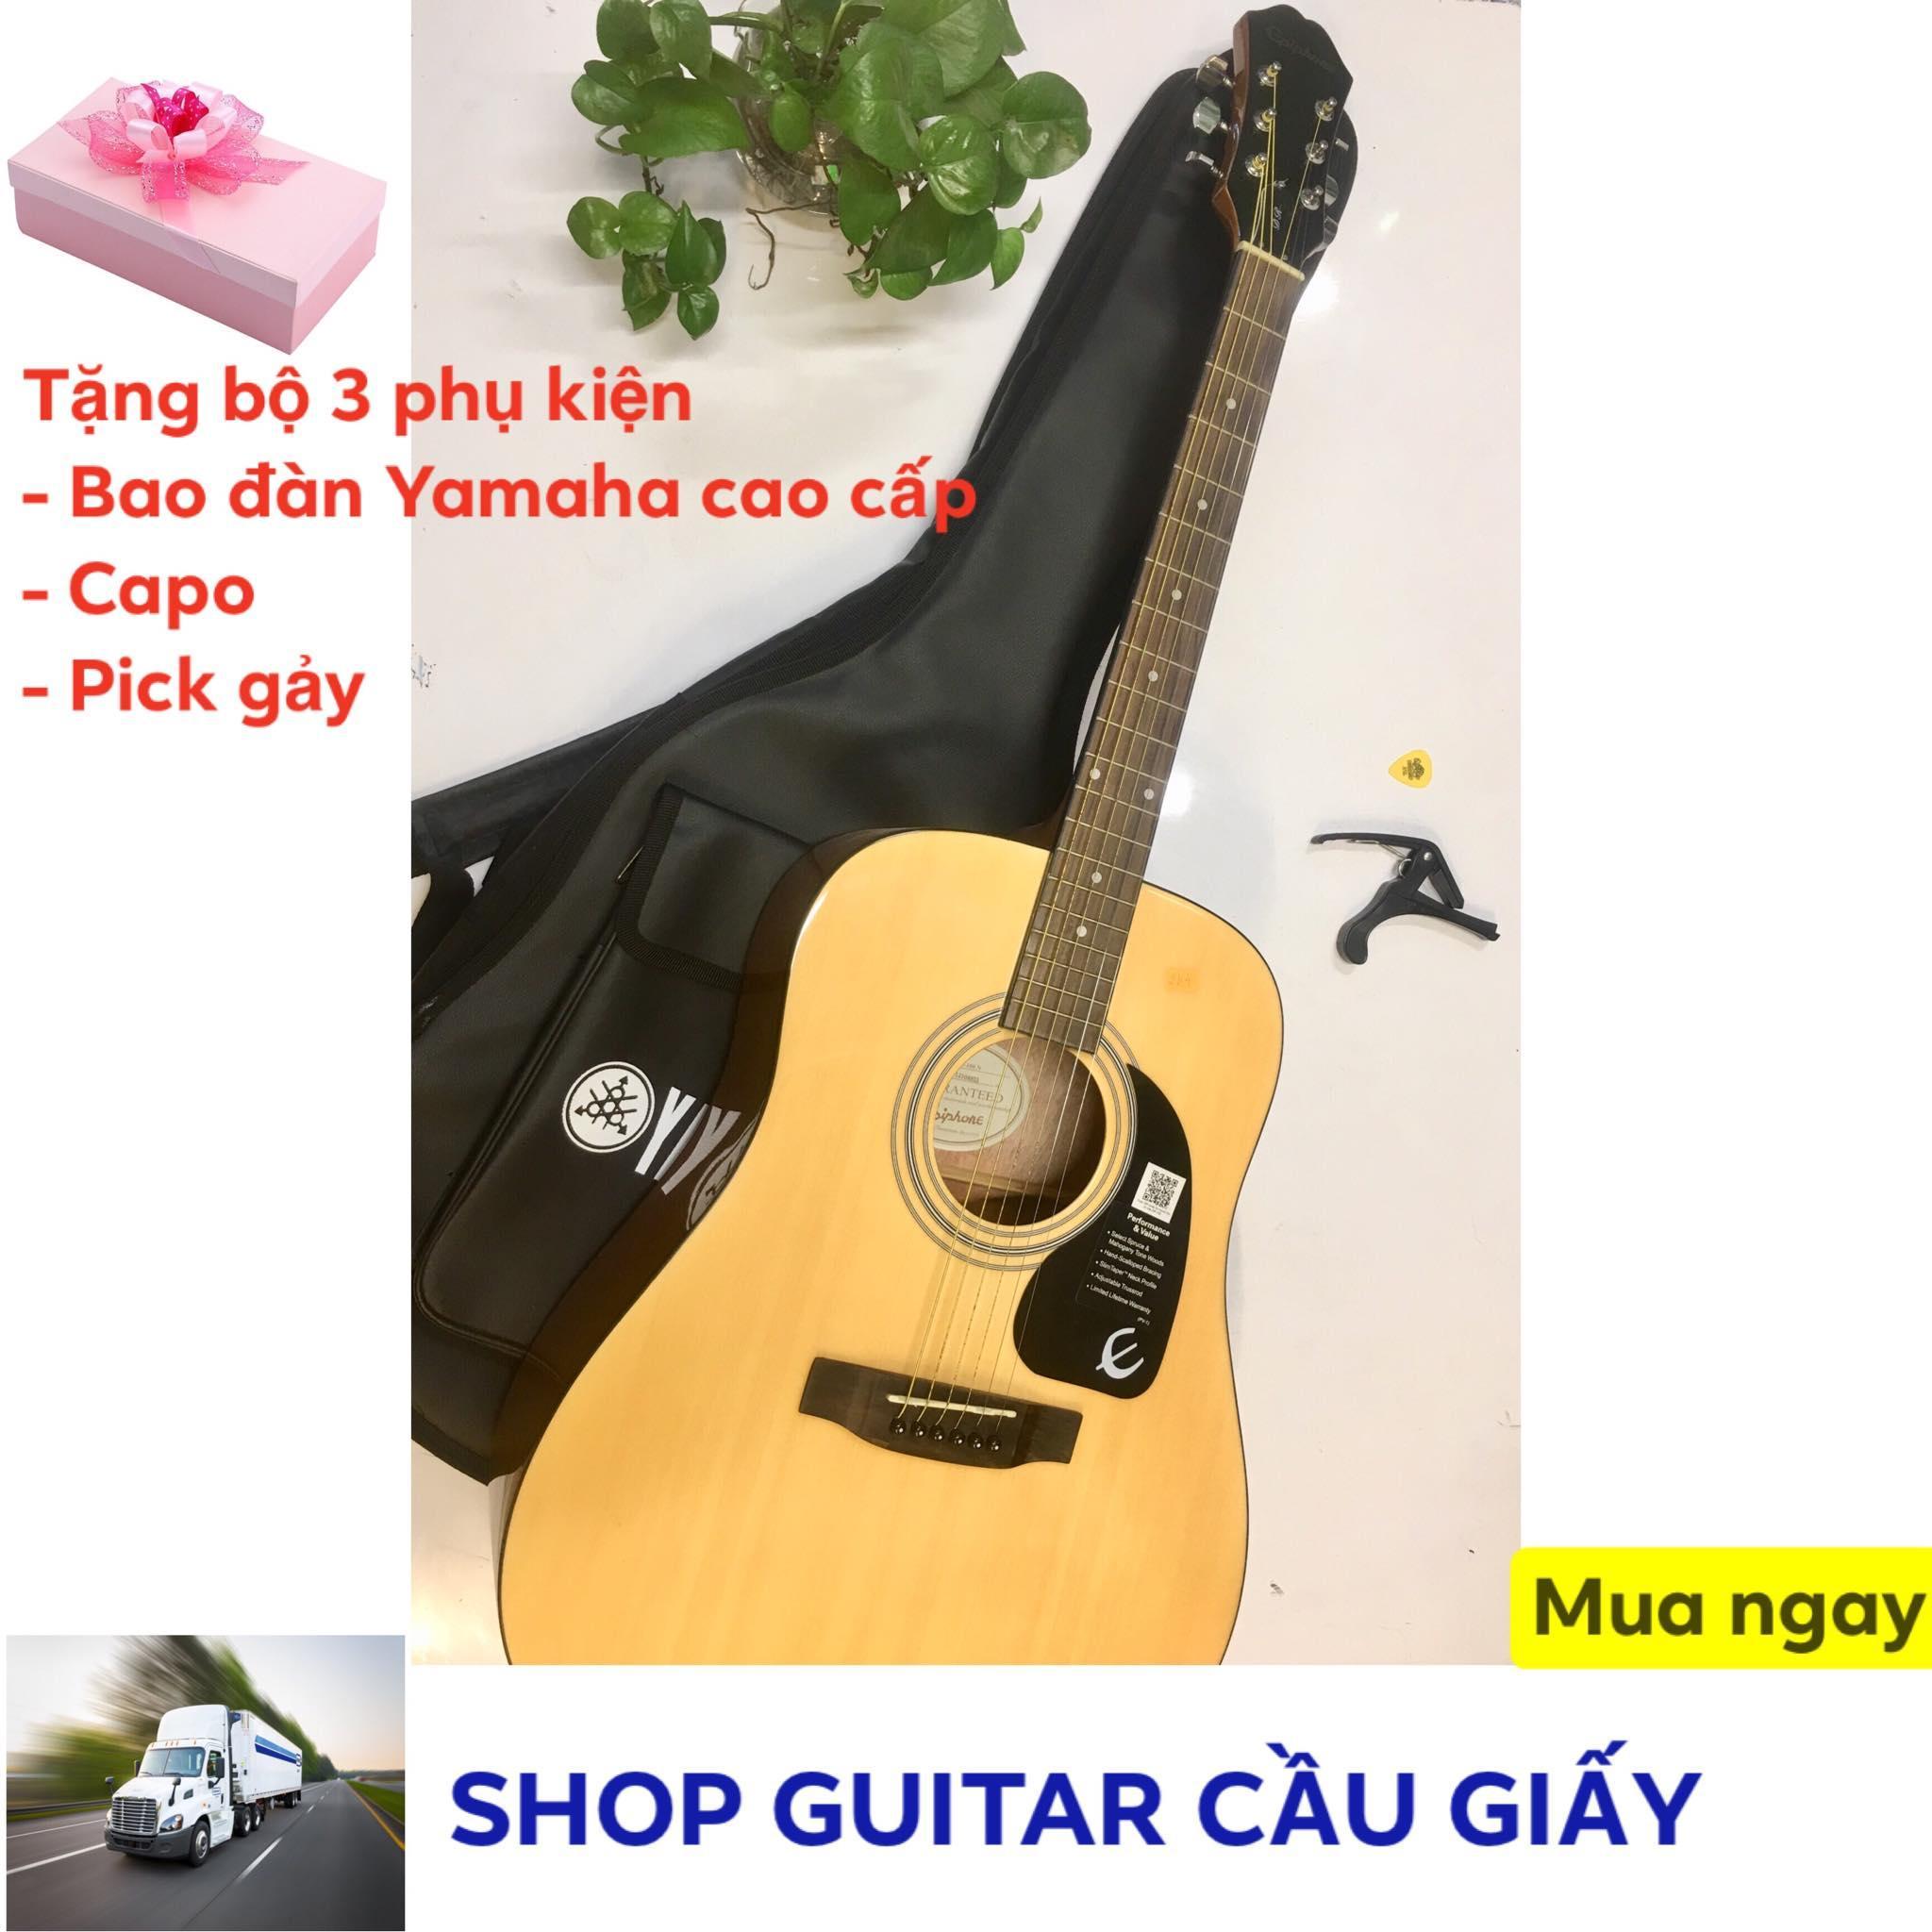 Đàn guitar Acoustic Epiphone DR-100 + tặng kèm bao da Yamaha, capo, pick gảy